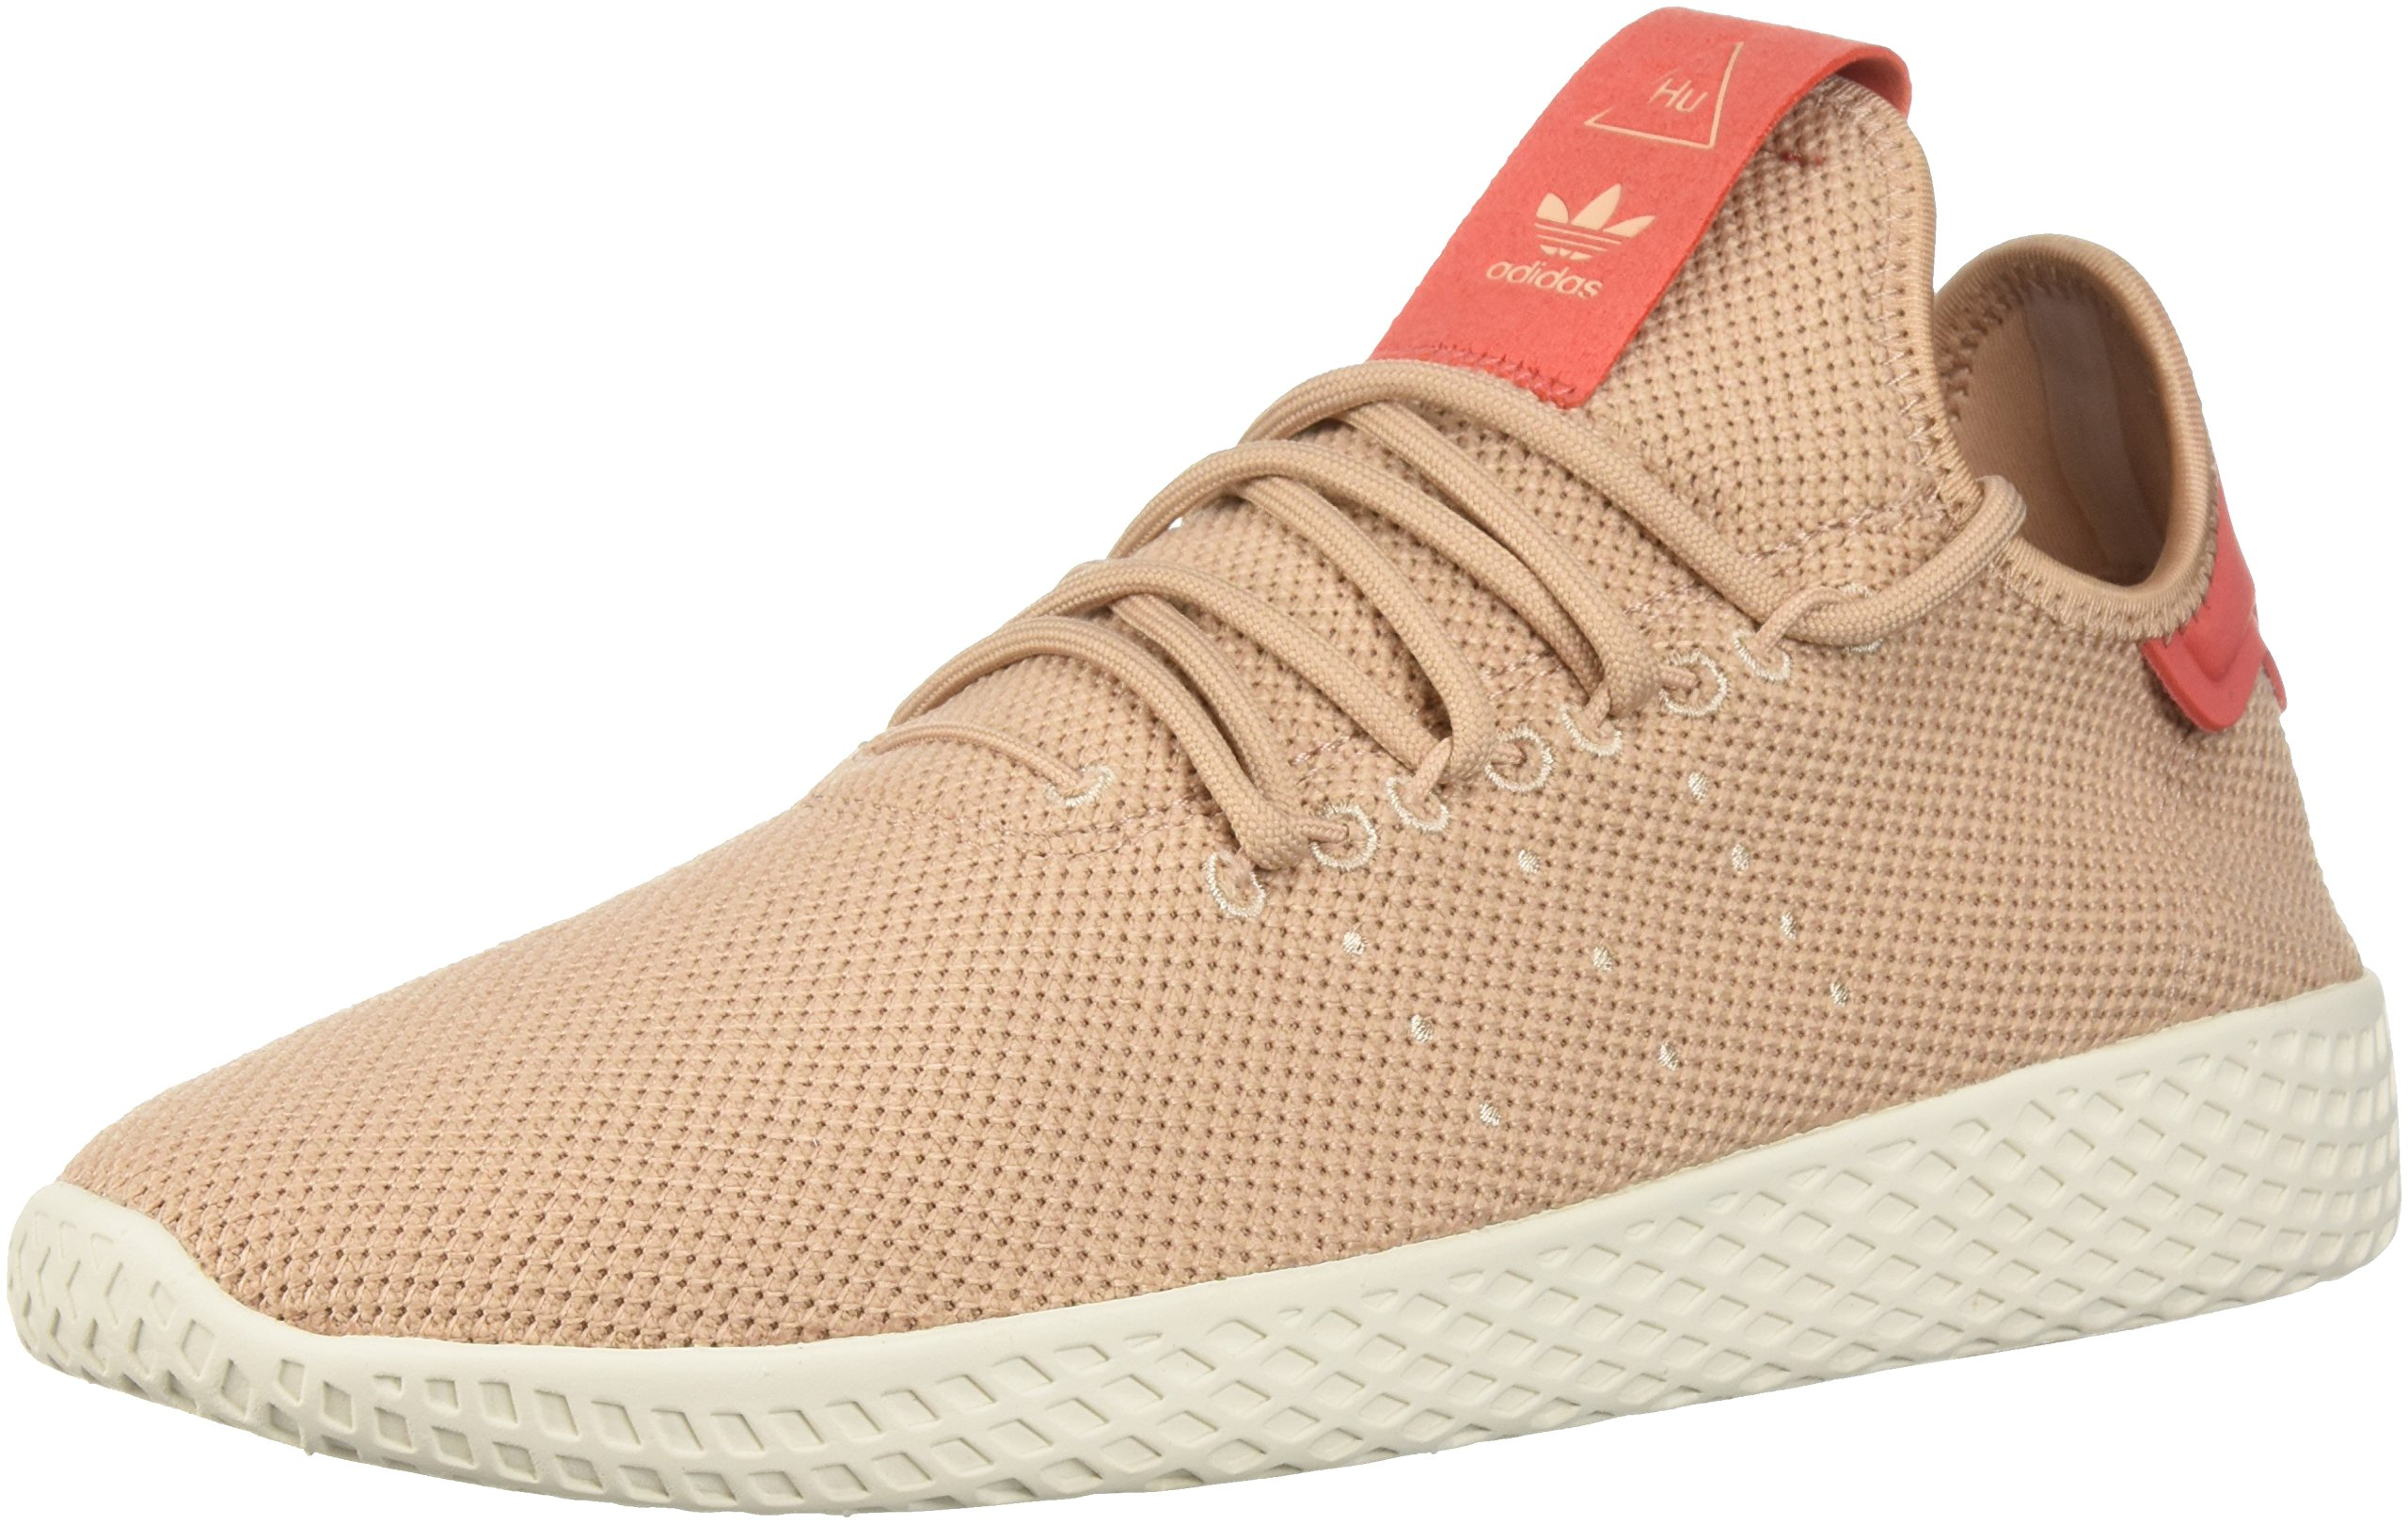 Adidas Kids' Pw Hu C Tennis Shoe,Carbon/Carbon/Chalk White,8 Medium US by adidas Originals